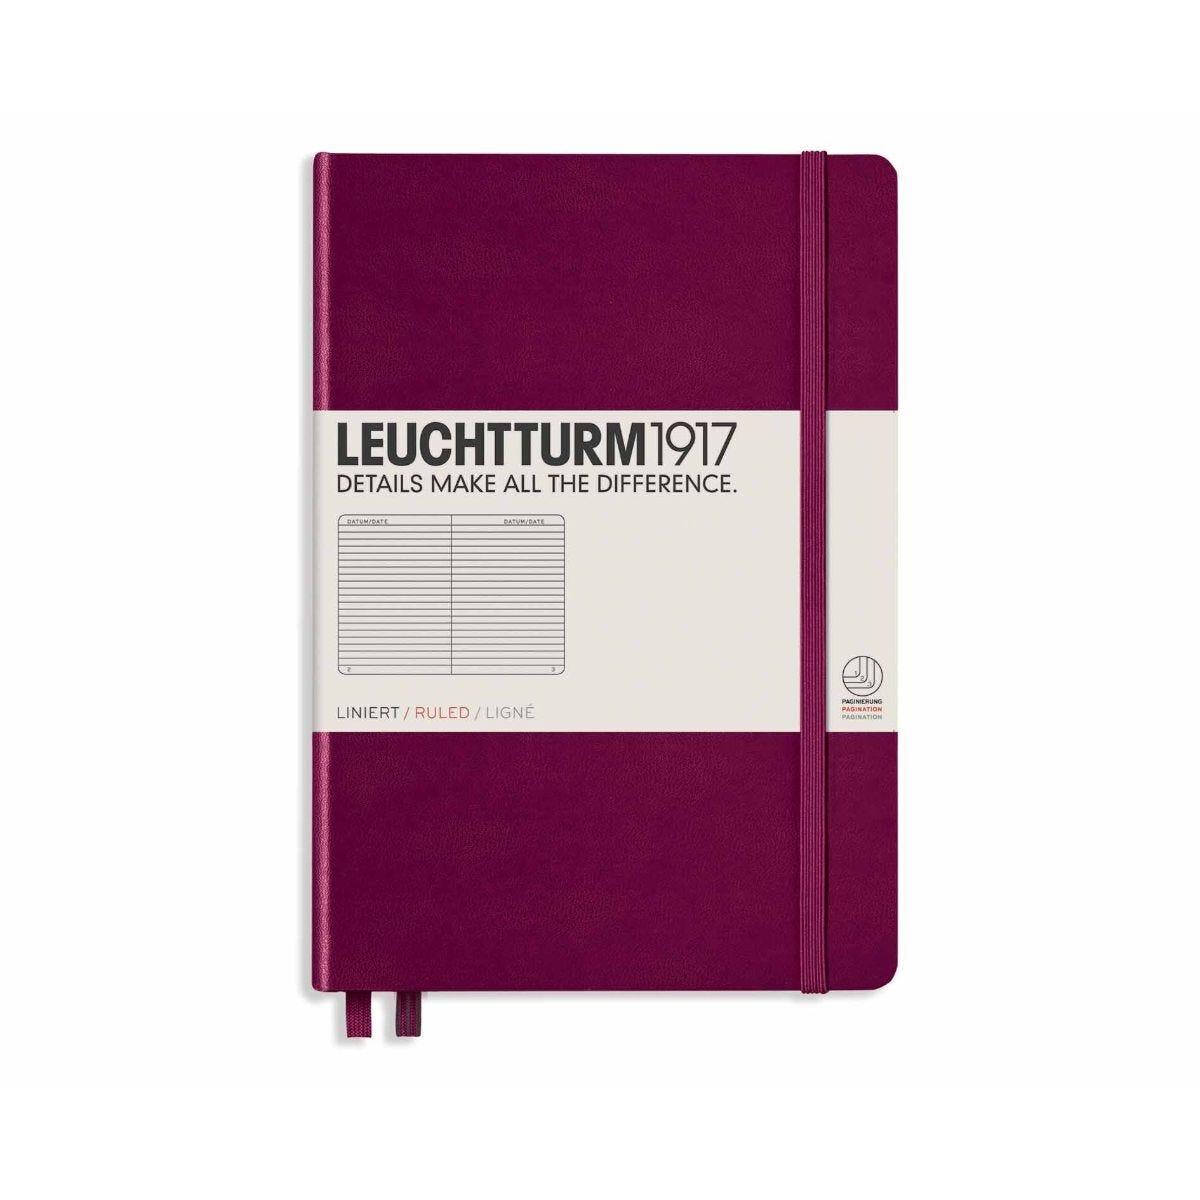 Leuchtturm1917 Hardcover Notebook Ruled A5 Port Red